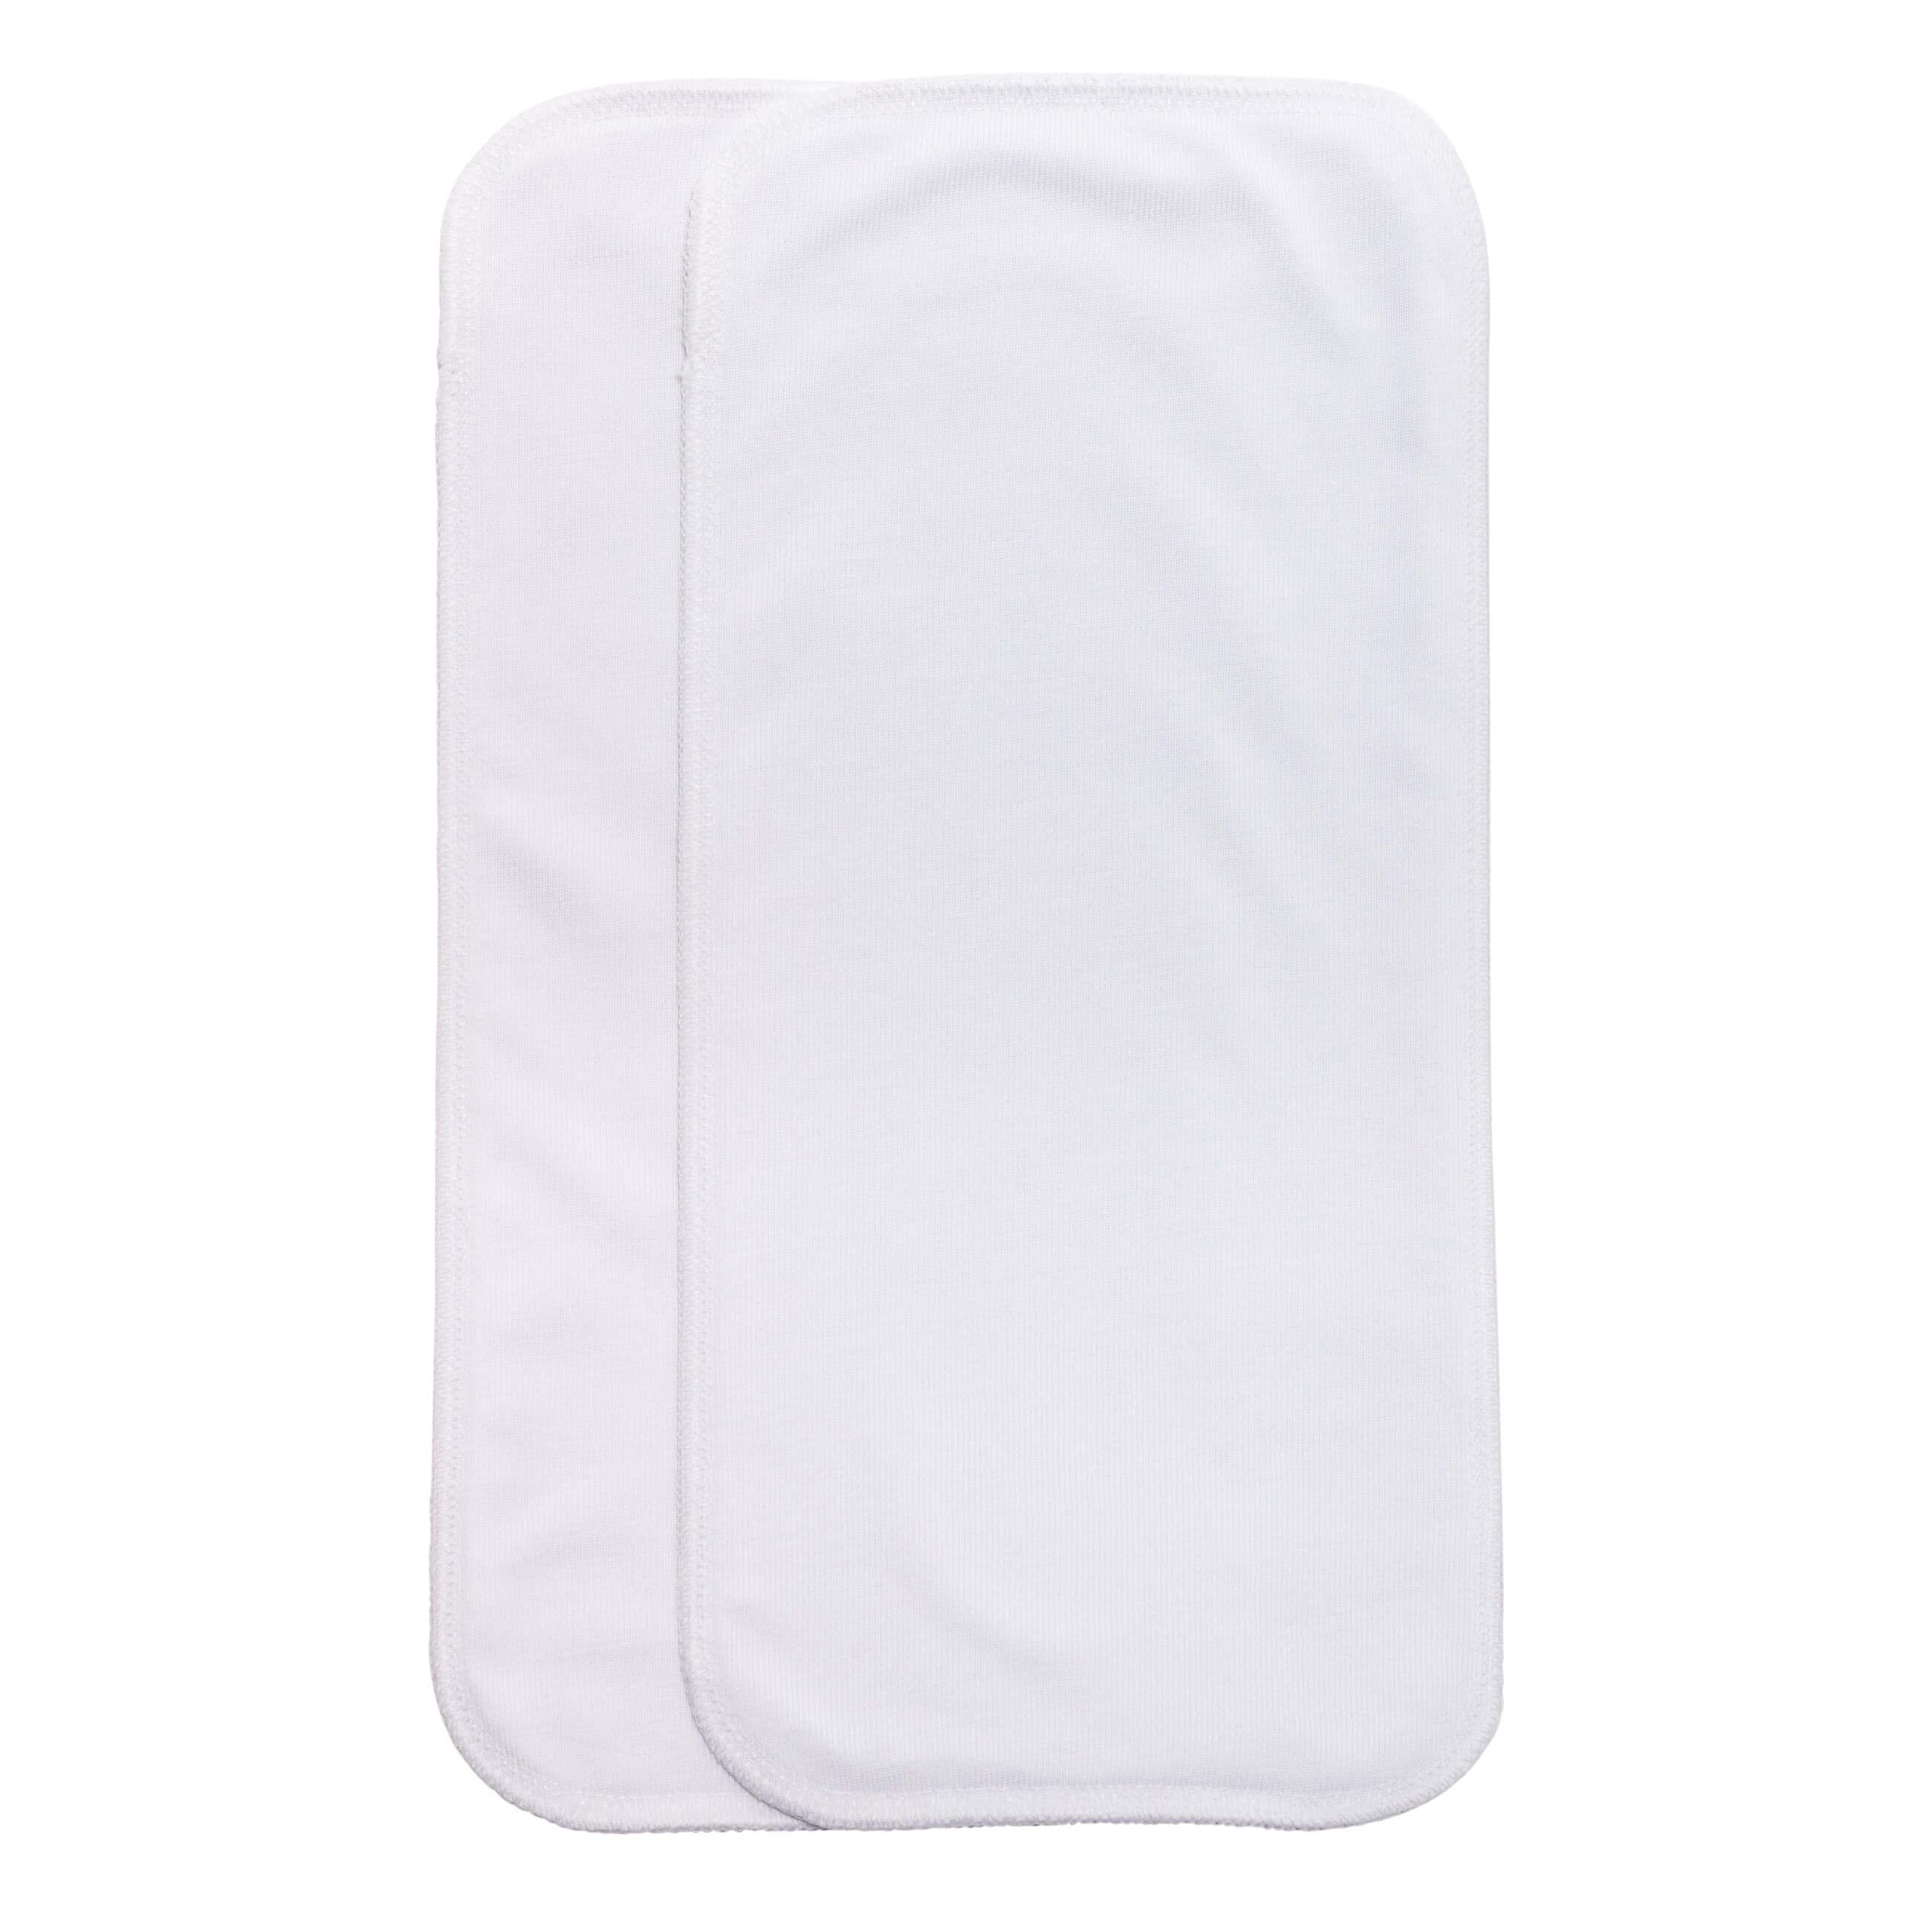 Stoffwindel Testpaket Überhosen One Size